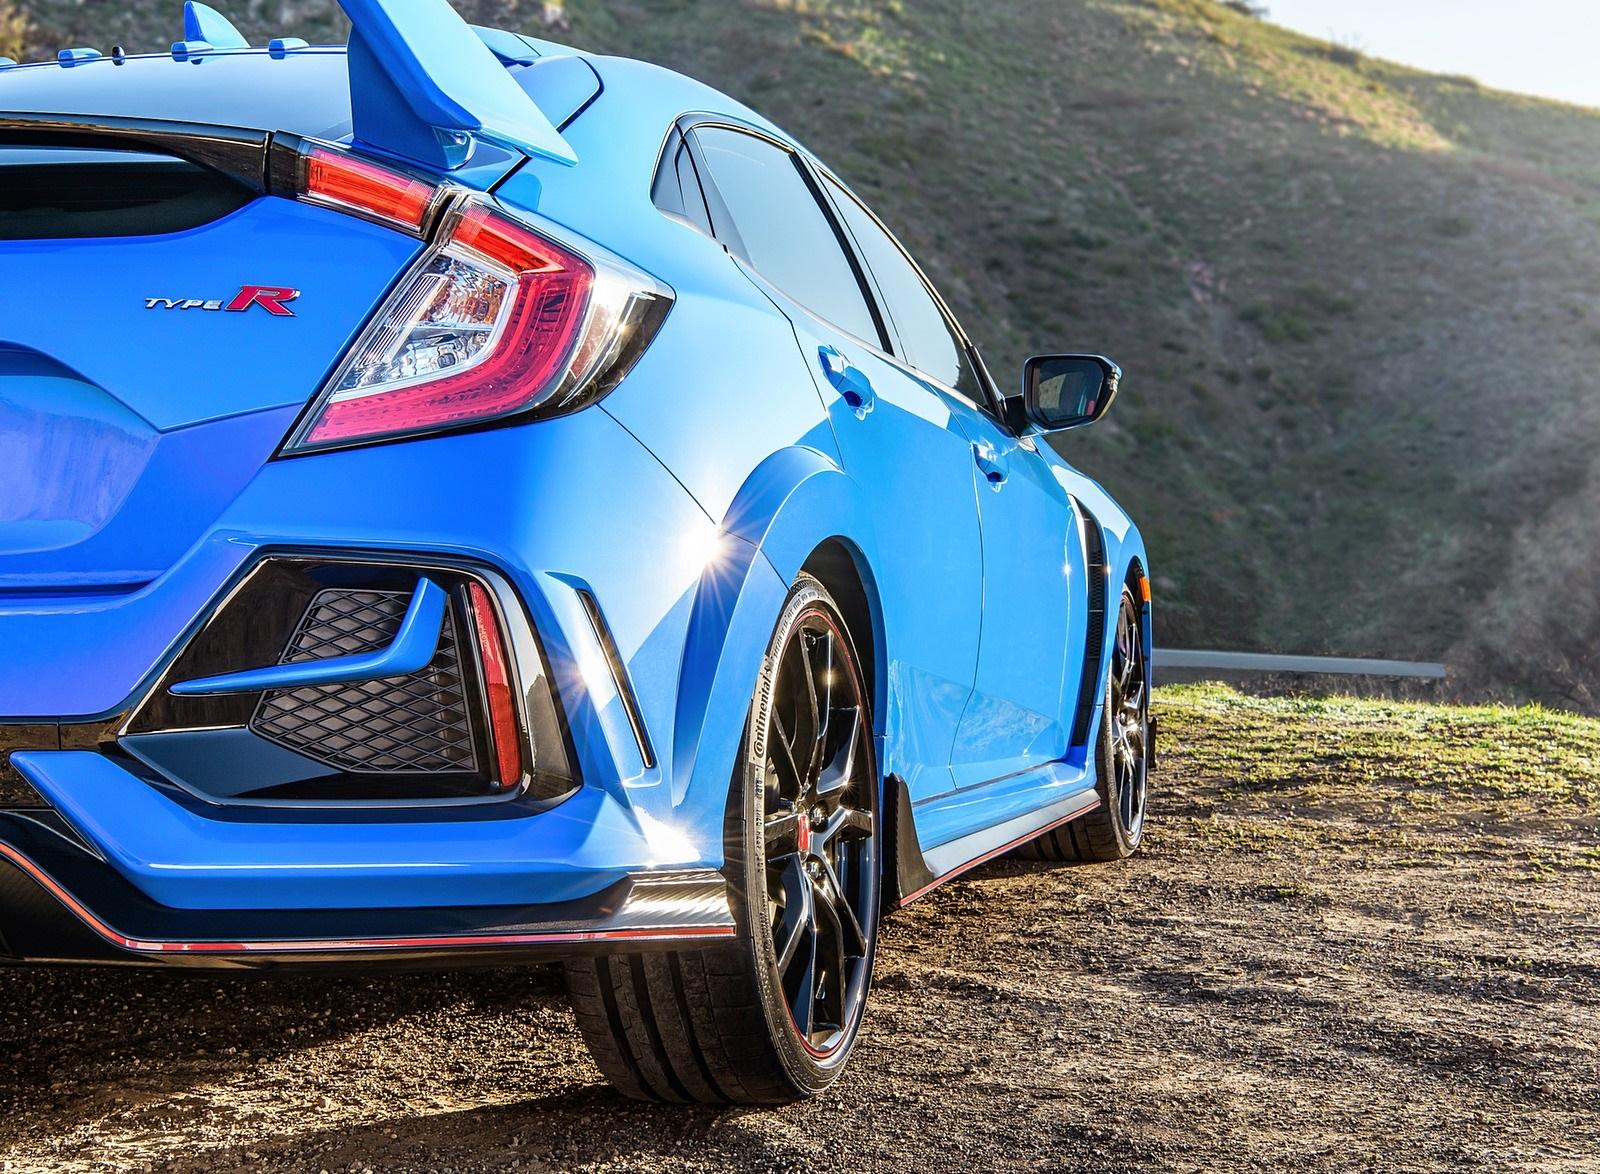 2020 Honda Civic Type R Detail Wallpapers (6)